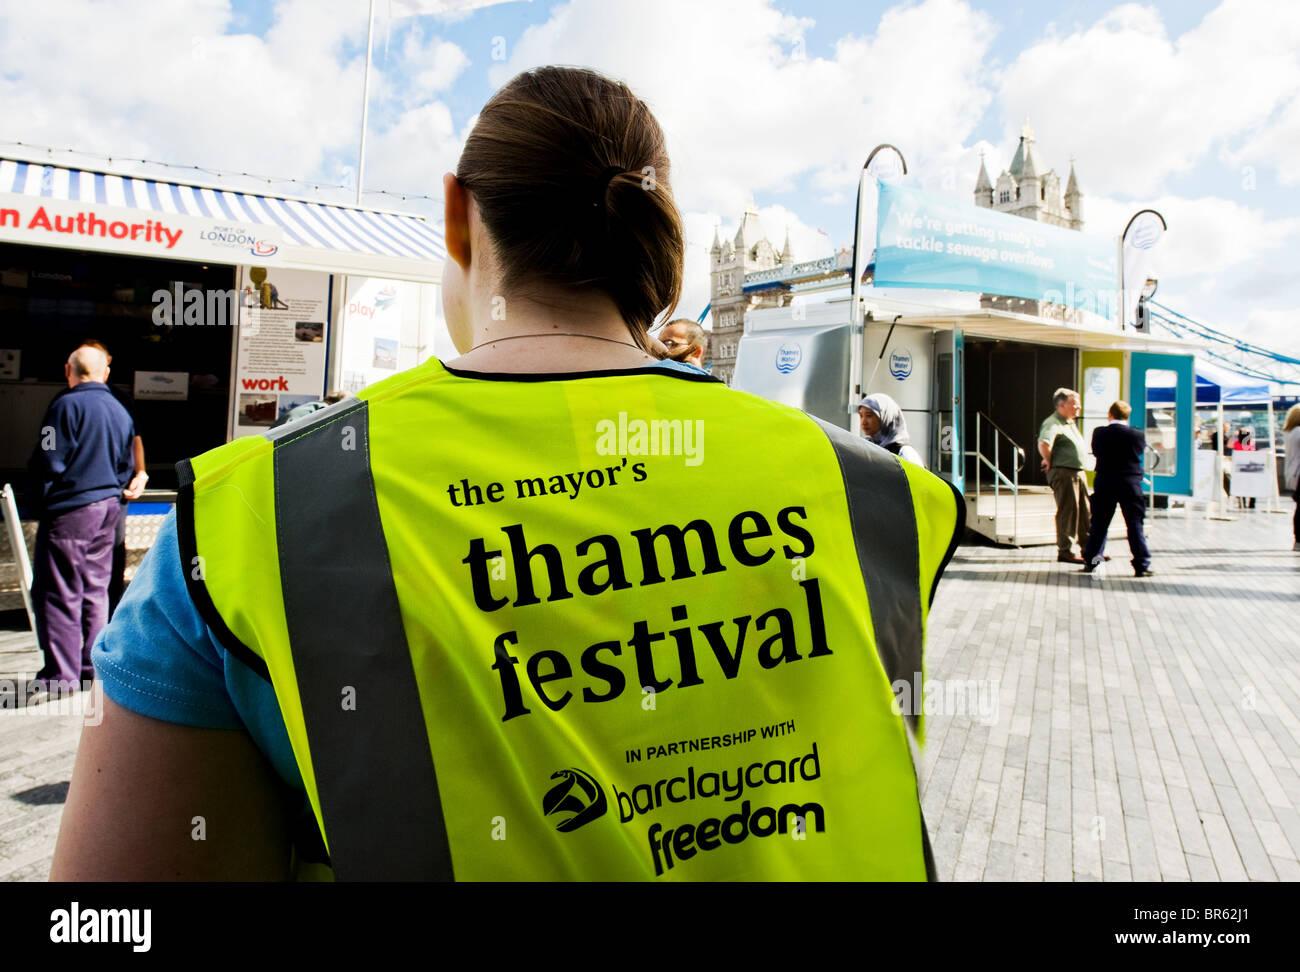 A steward wearing a hi-viz jacket at the Thames Festival in London. Stock Photo